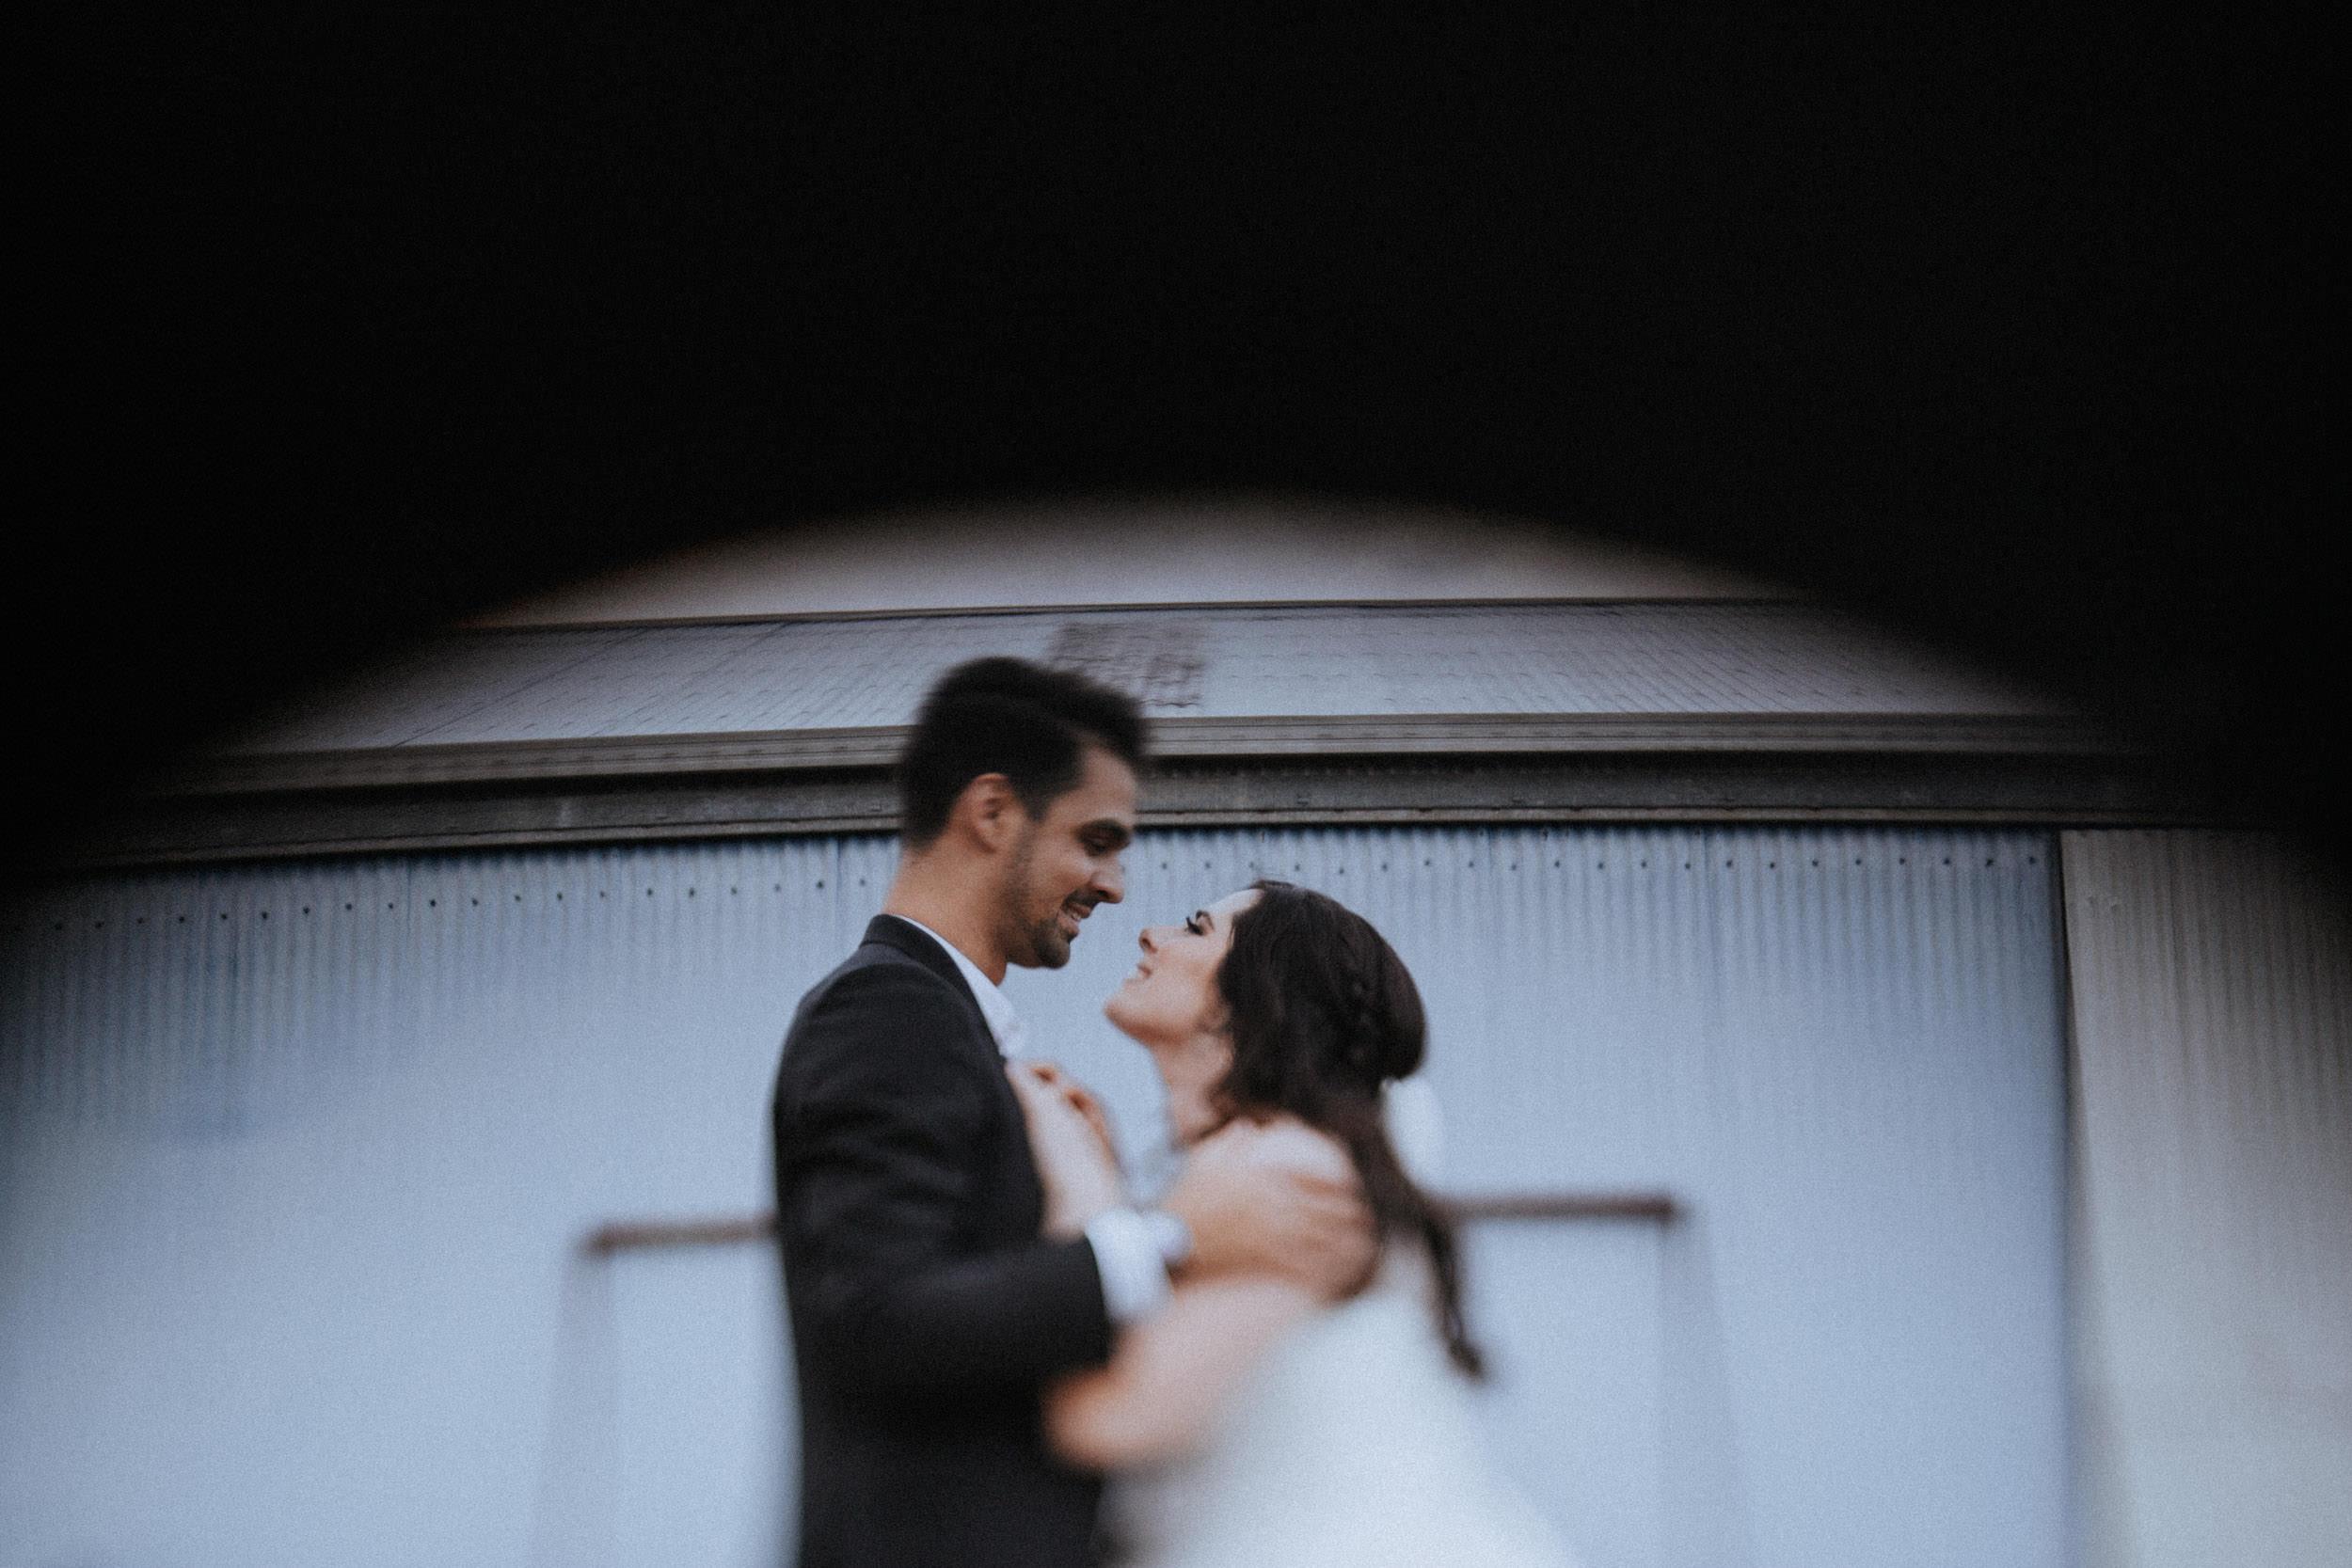 s+j_top_elopement wedding photography_kings & thieves_blog - 407.jpg